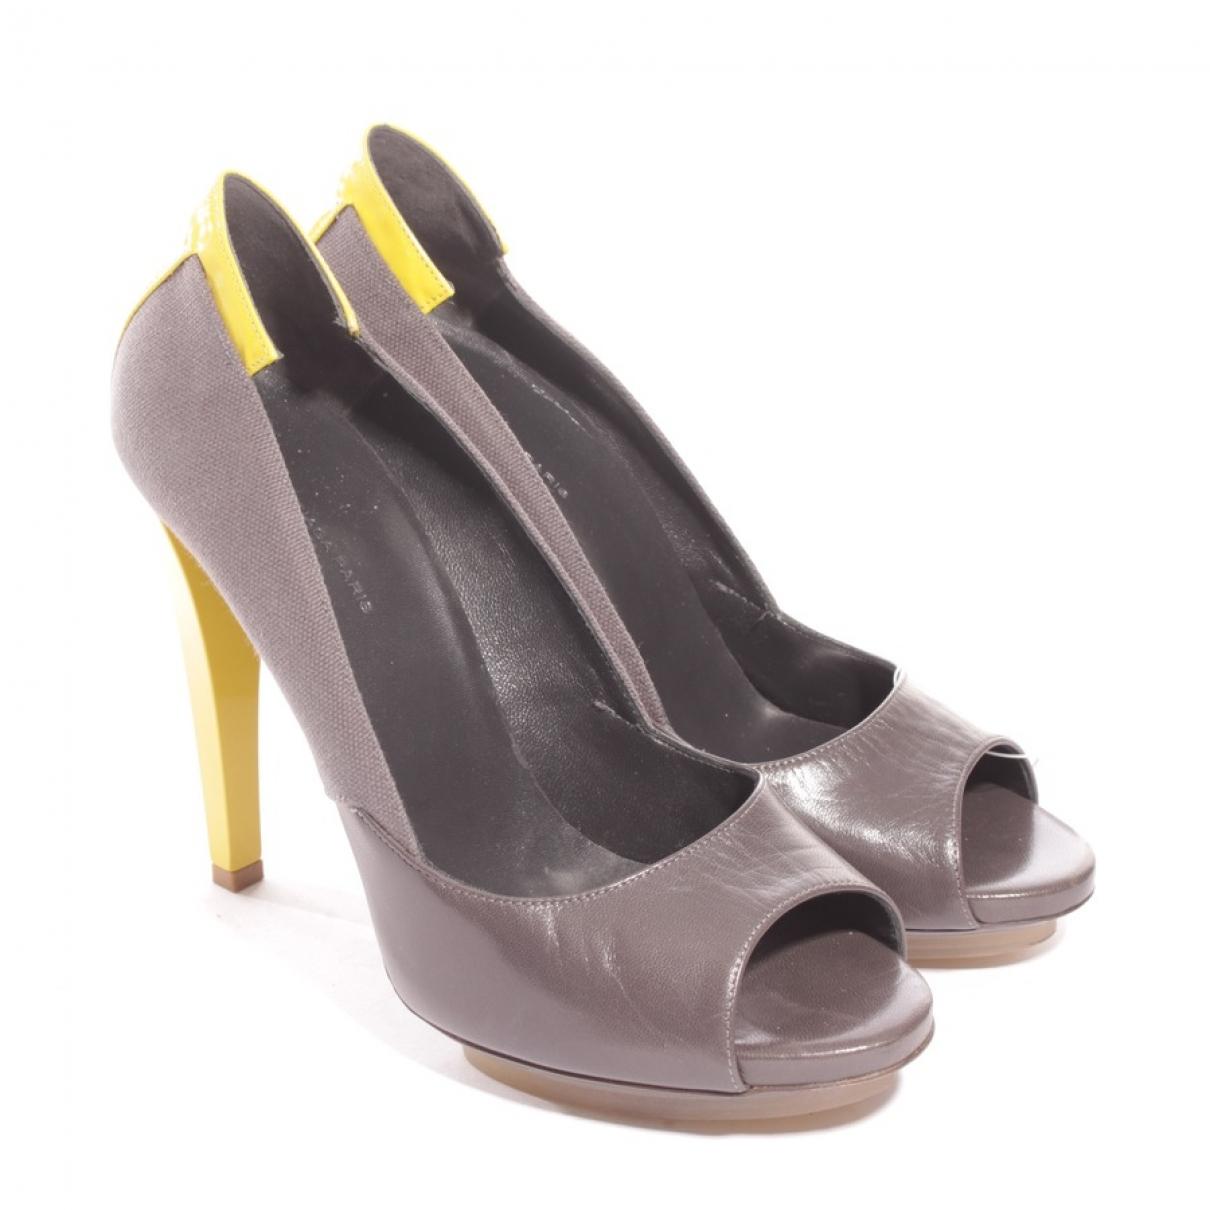 Balenciaga \N Multicolour Leather Heels for Women 39.5 EU